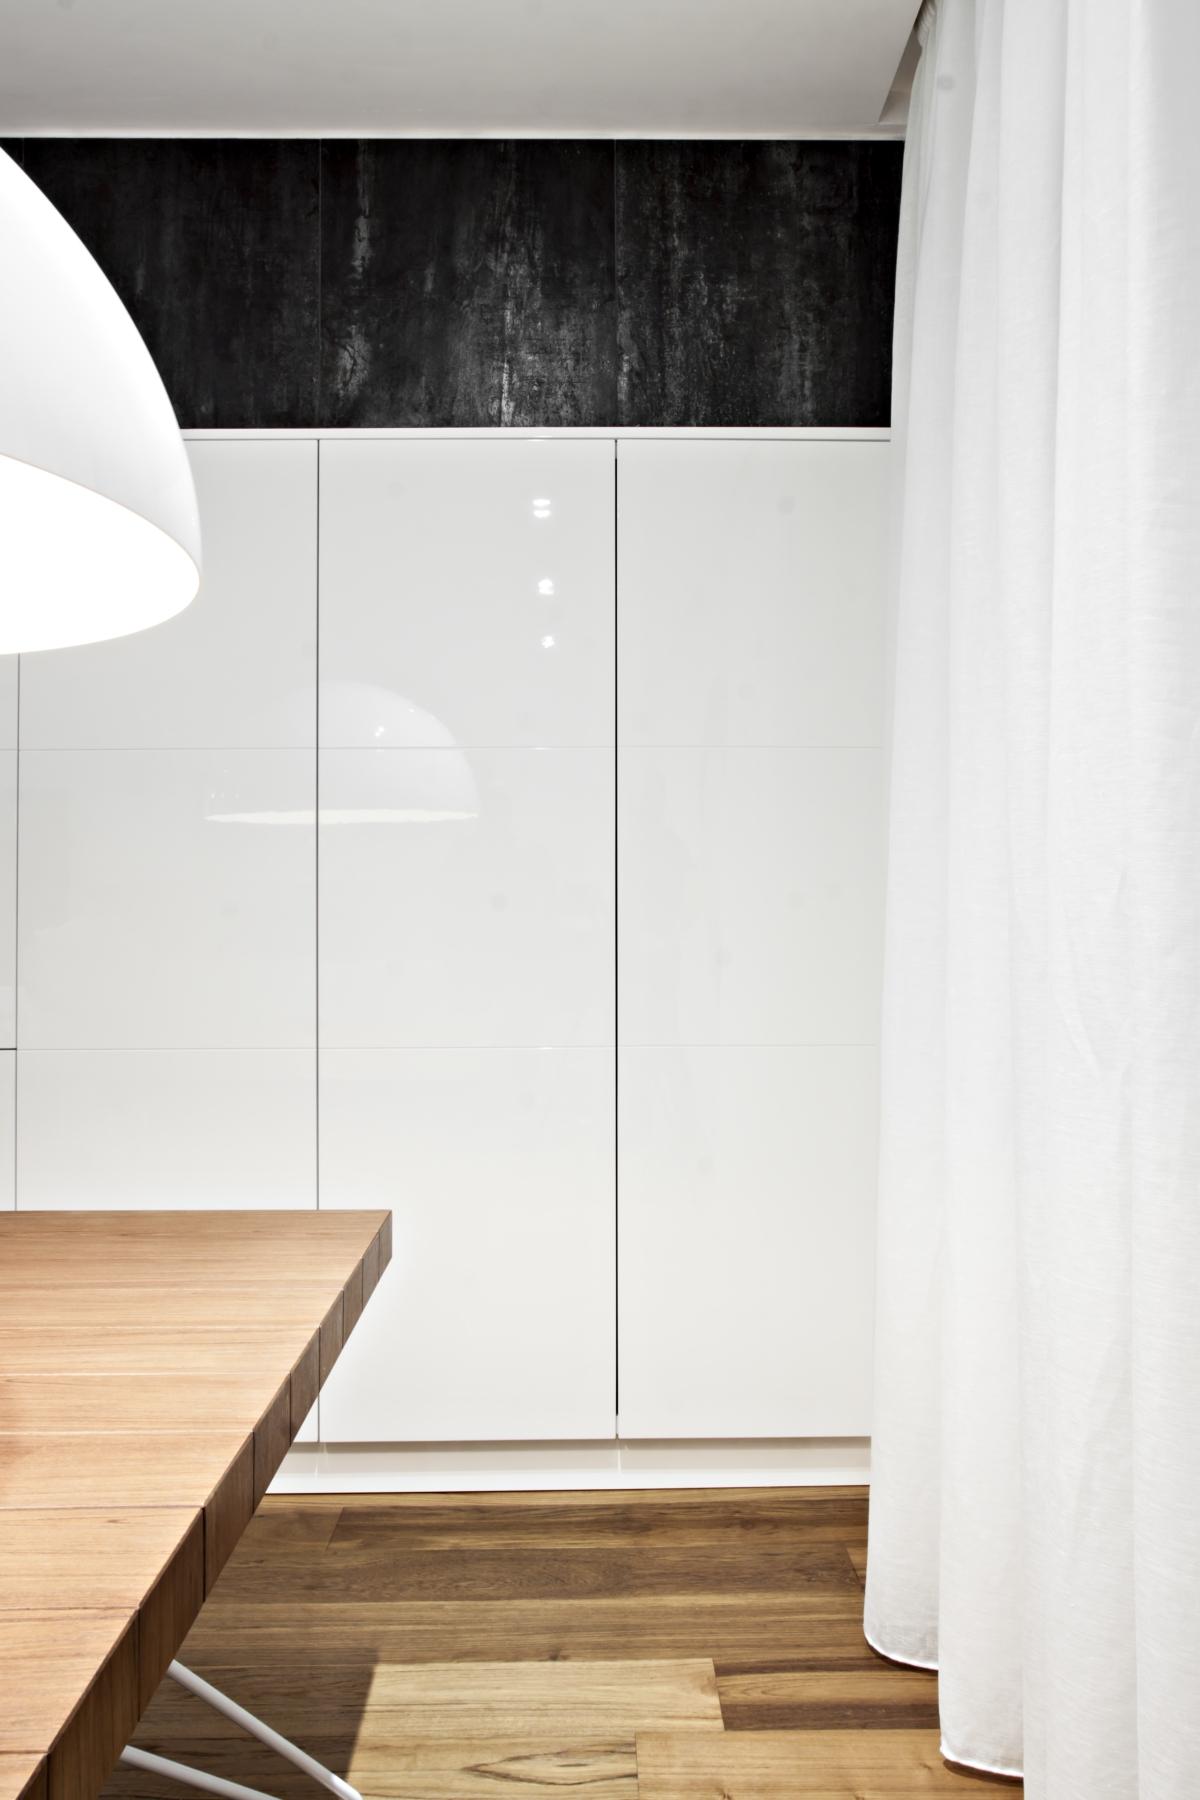 sg-Haus-michelangelo-Olivieri-for-m12ad-29